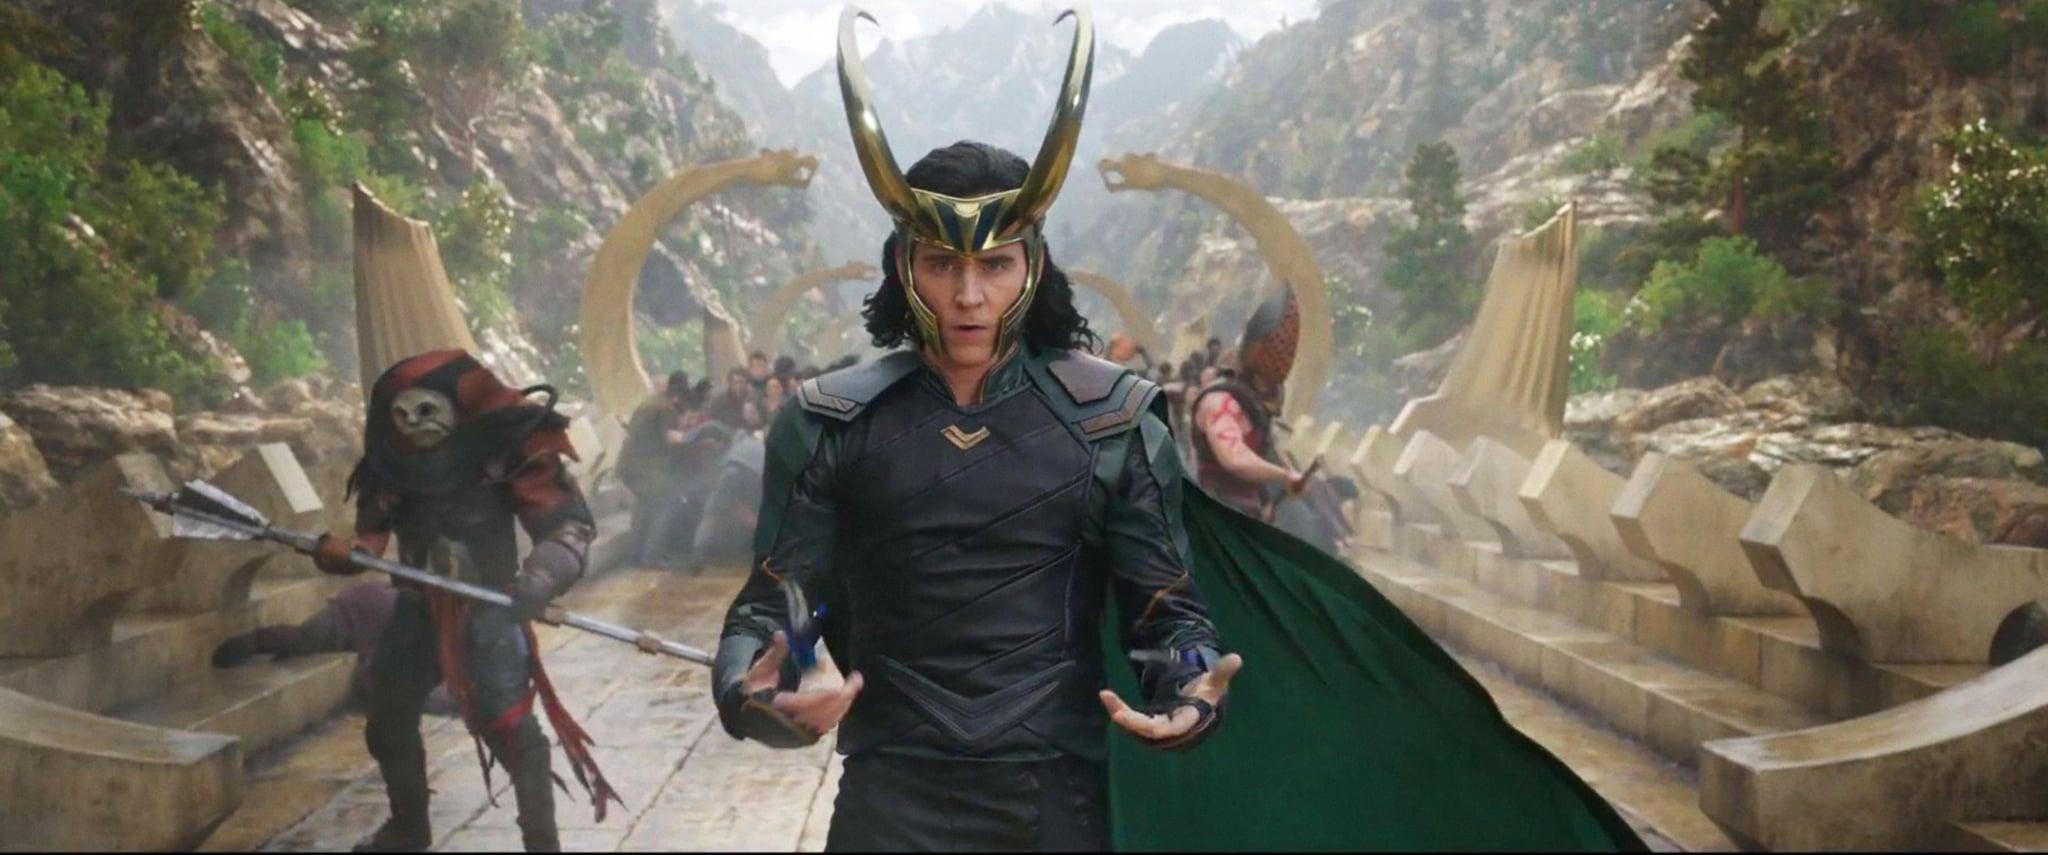 THOR: RAGNAROK, Tom Hiddleston as Loki, 2017. Walt Disney Studios Motion Pictures/courtesy Everett Collection